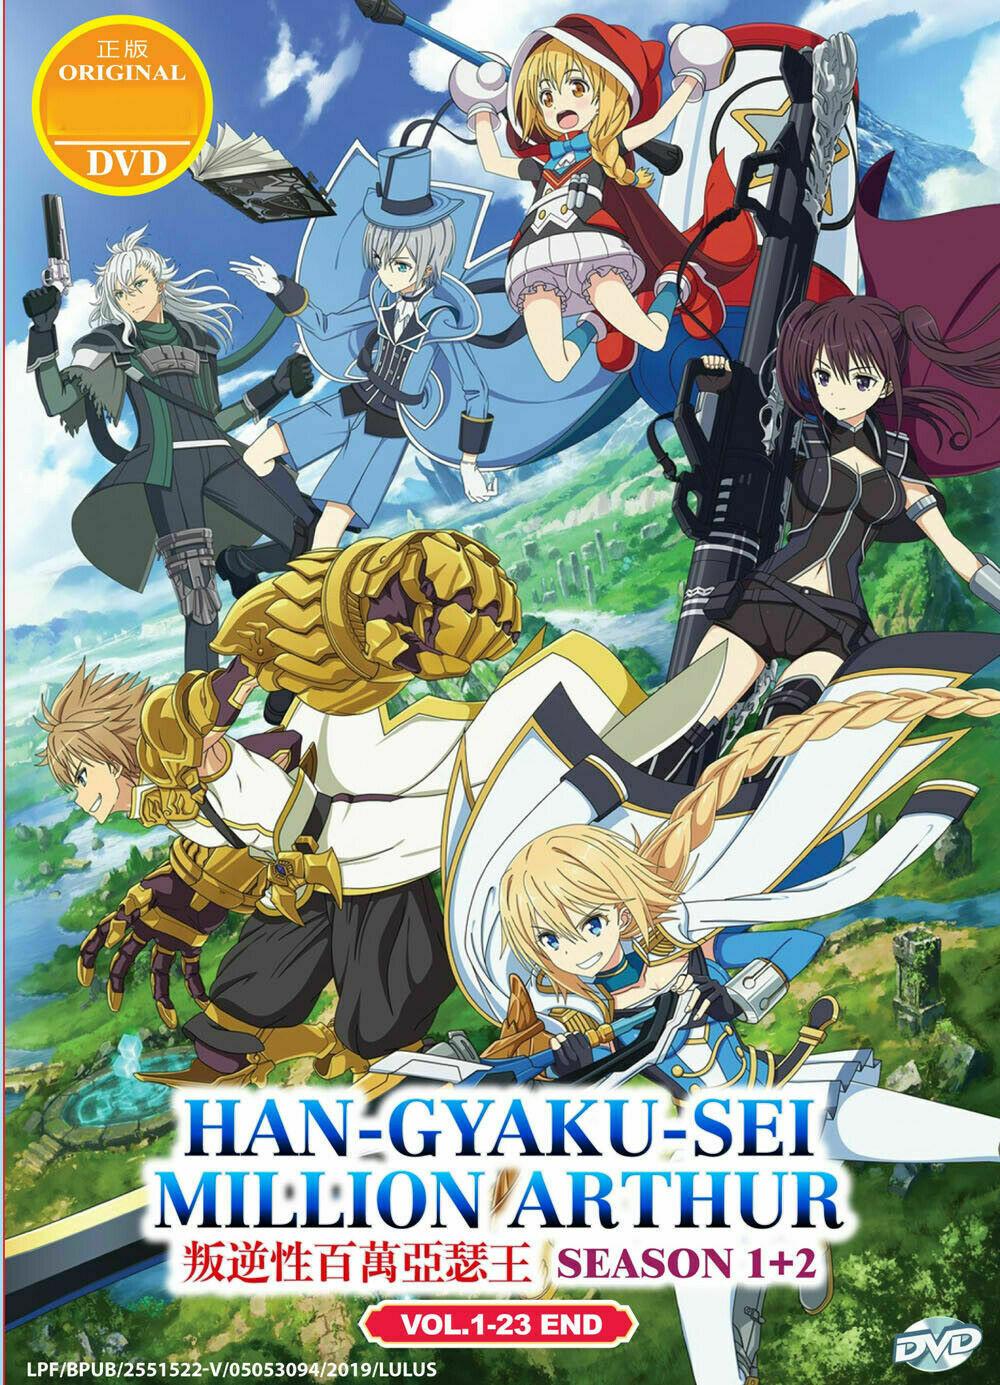 Han-Gyaku-Sei Million Arthur DVD (Season 1+2)(Vol. 1-23 end) English Dubbed